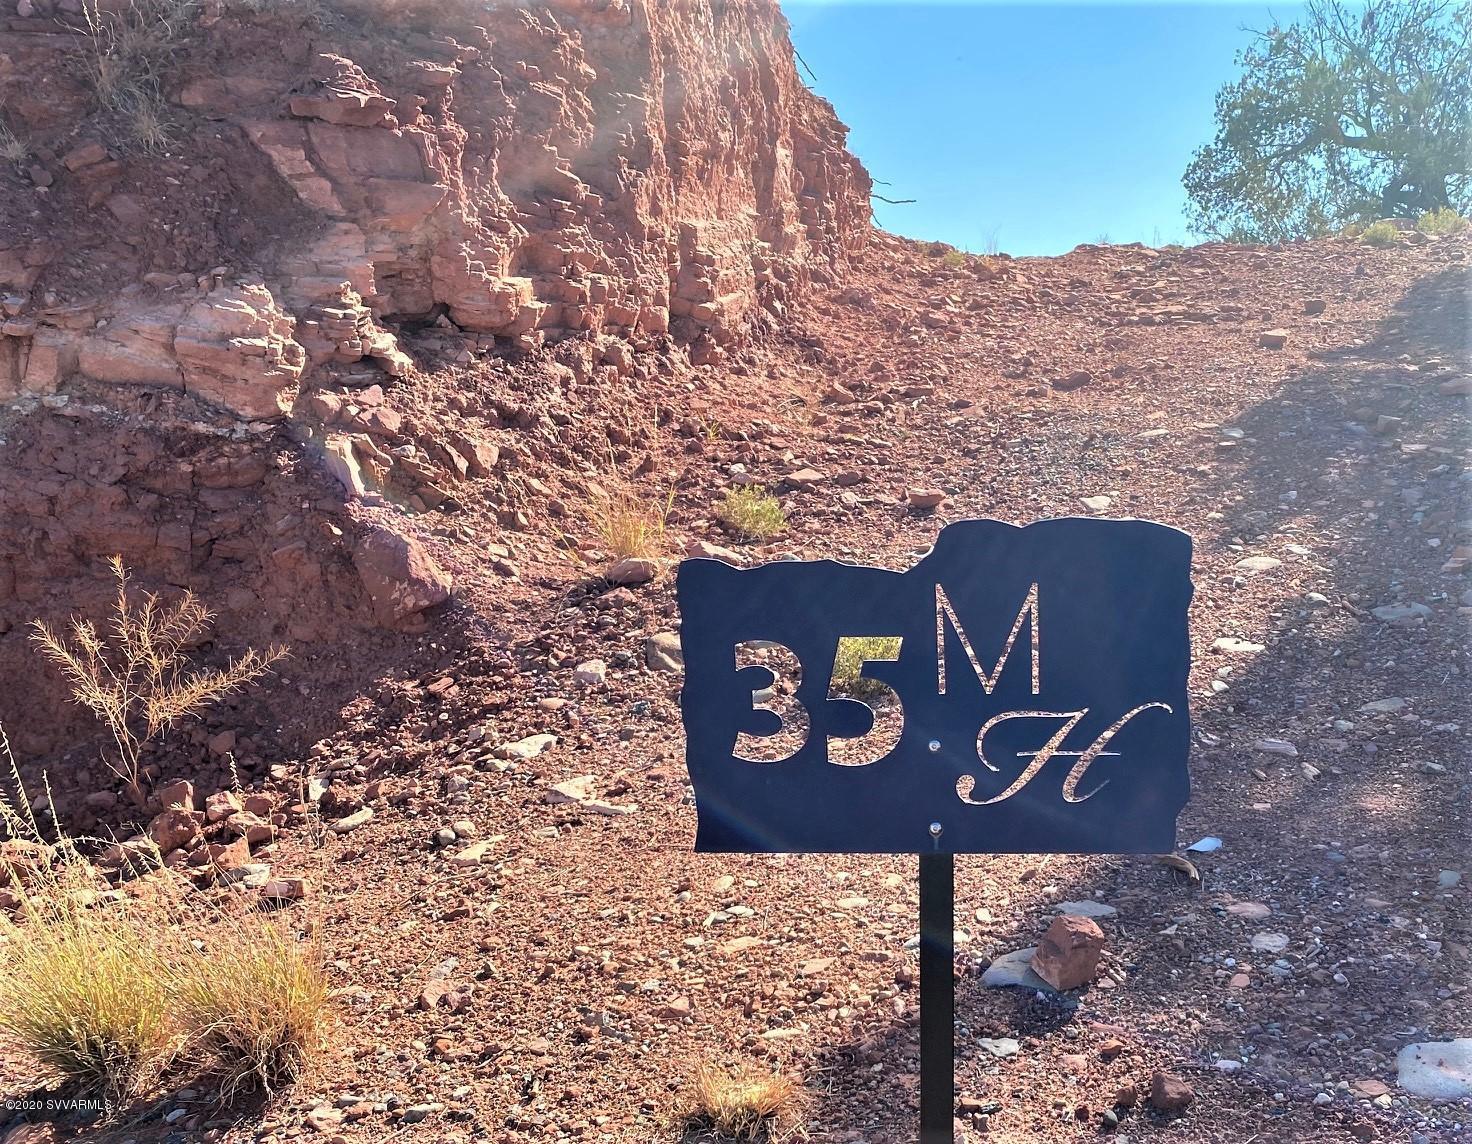 53 Pinnacle Sedona, AZ 86336